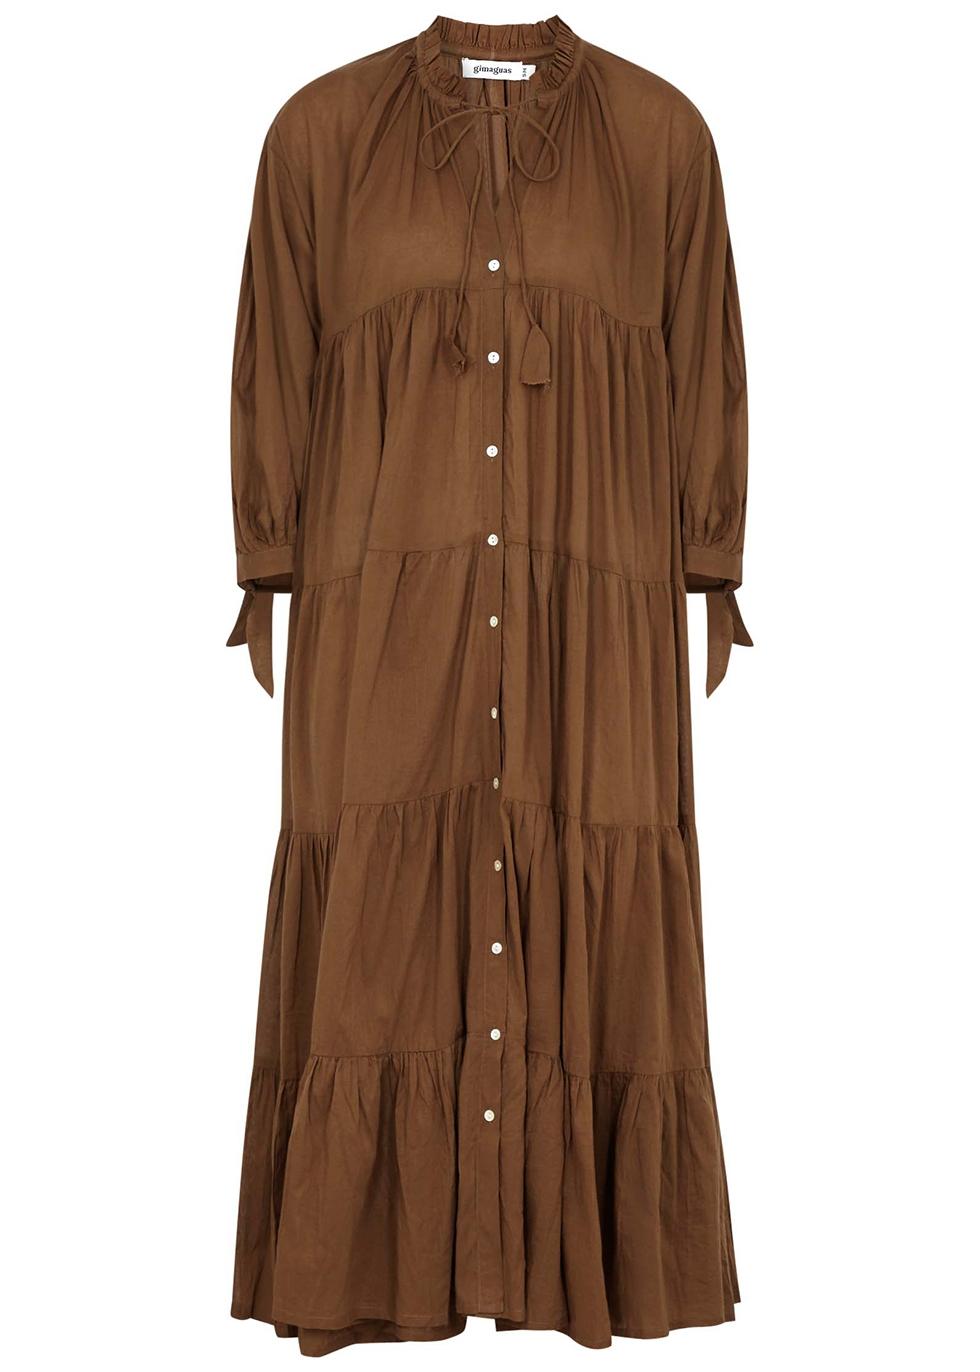 Oahu brown tiered cotton midi dress